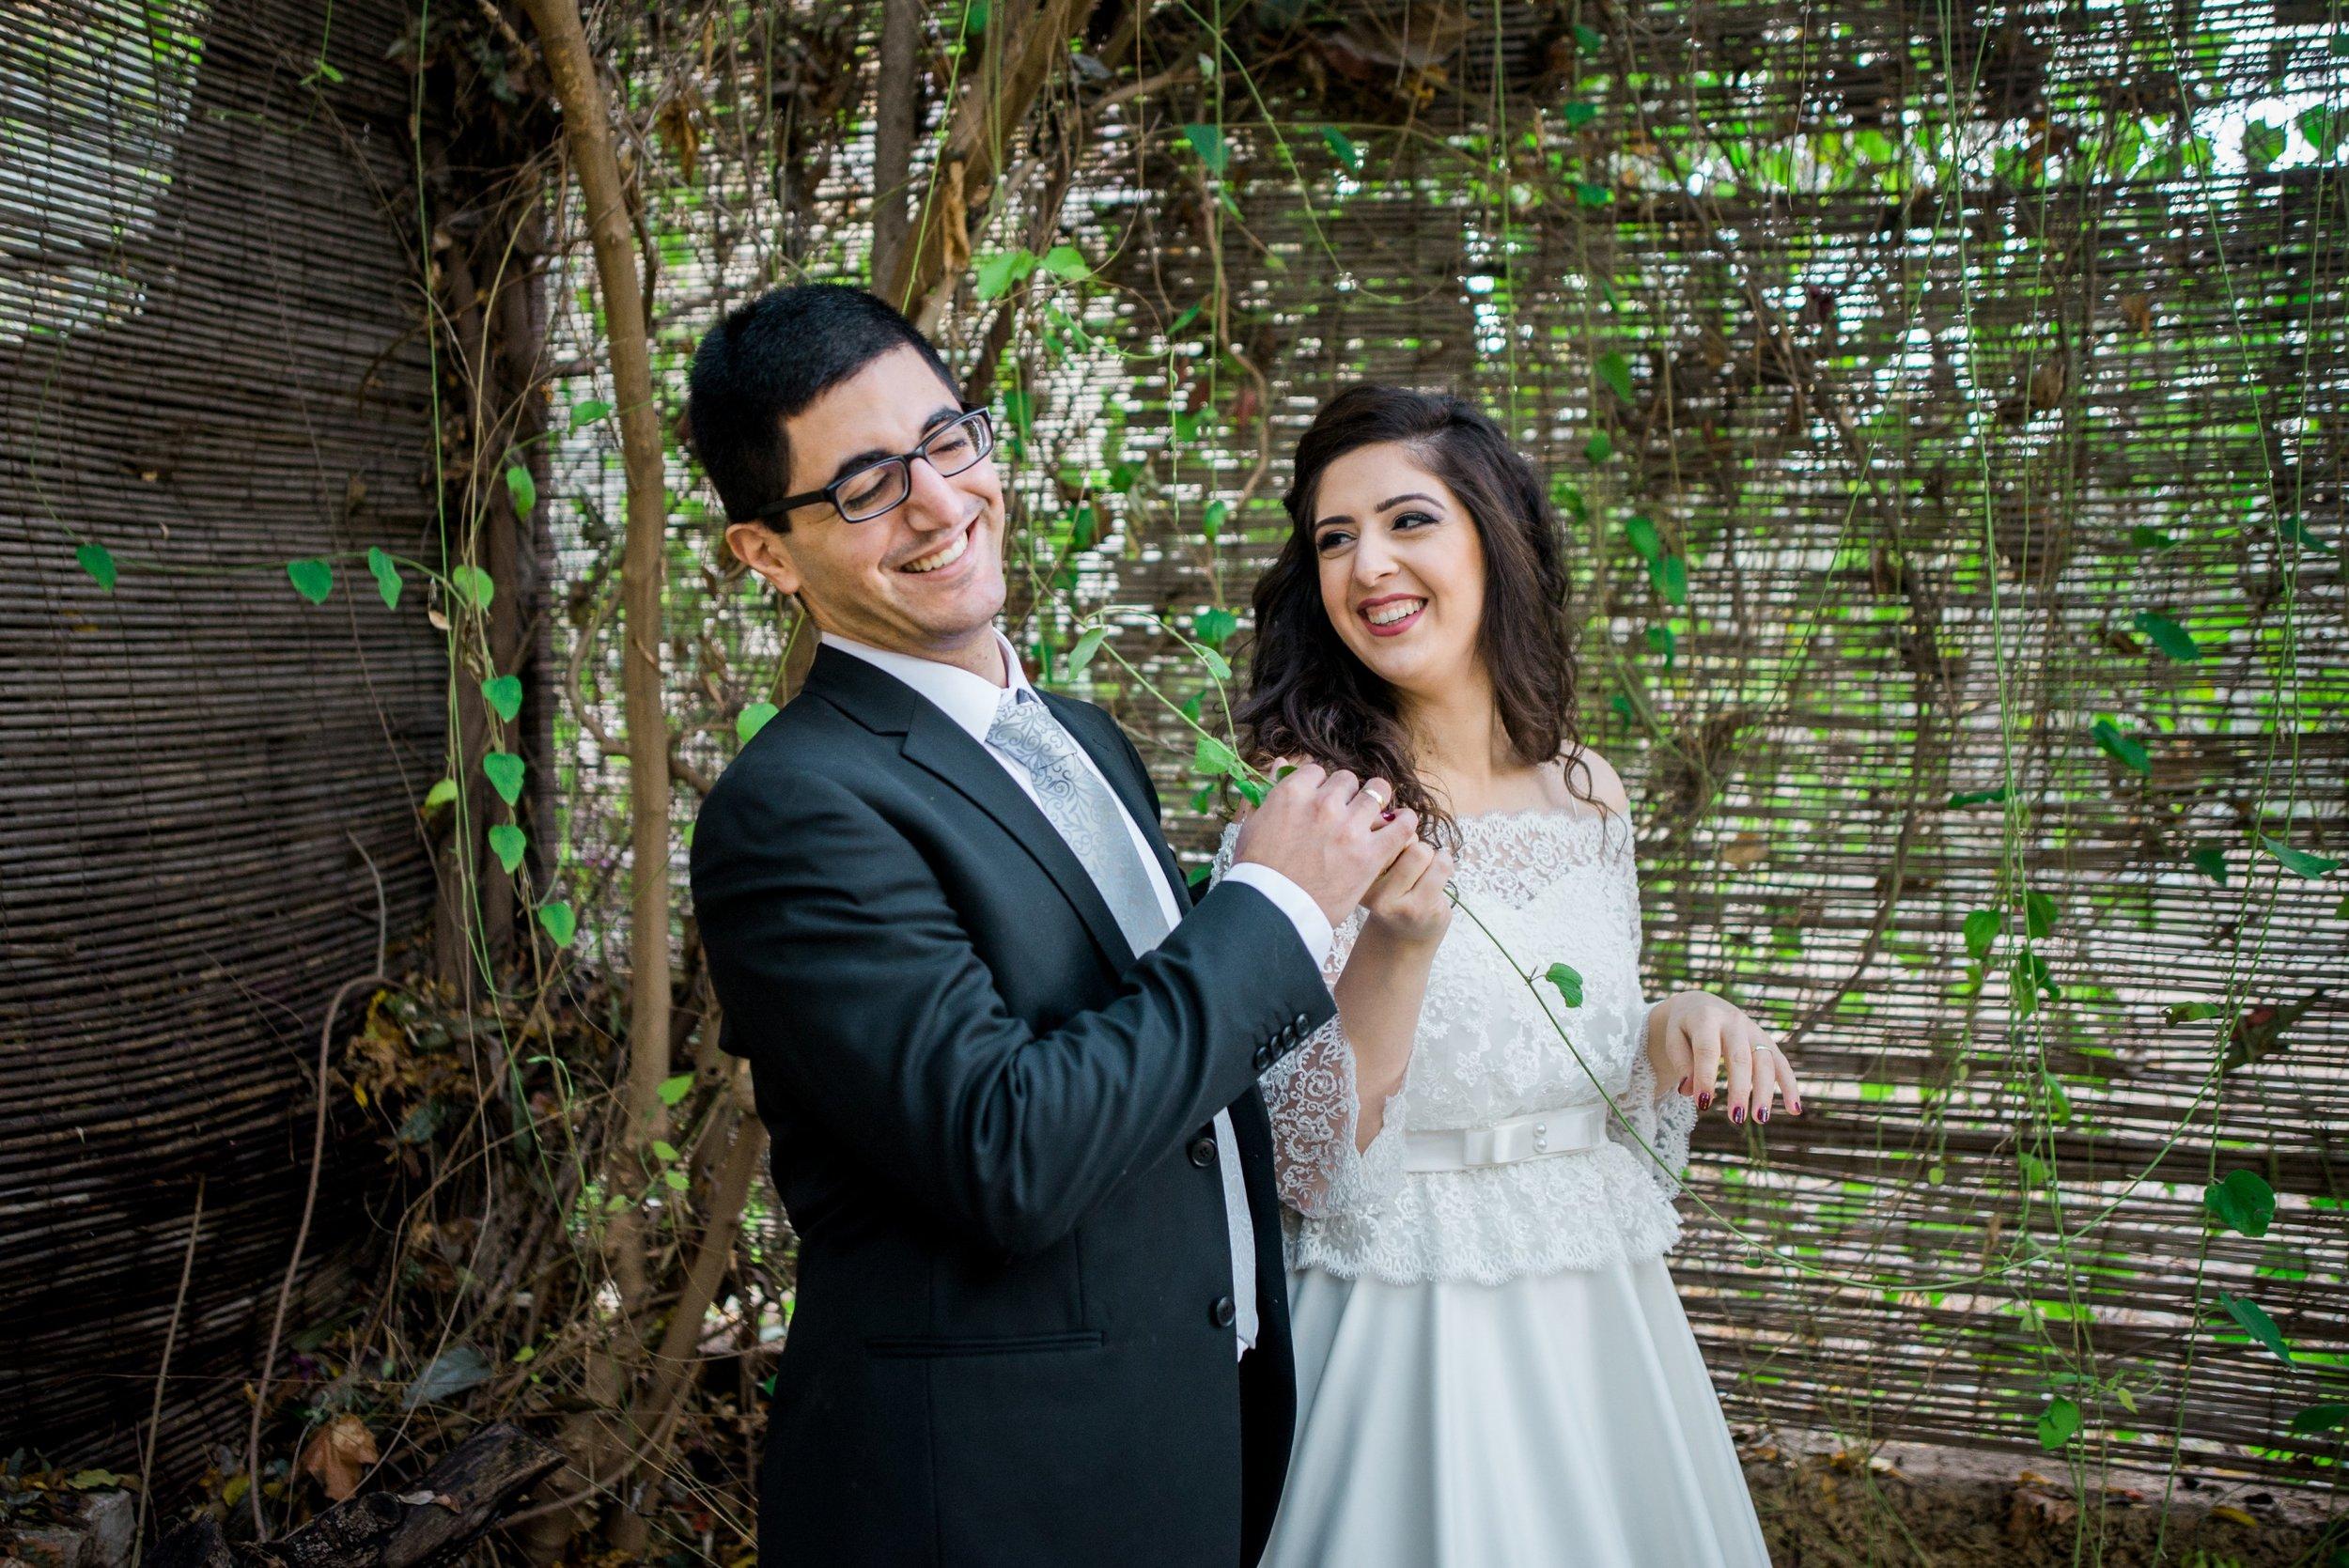 israel-garden-wedding-portraits-session-kate-giryes-photography--21_WEB.jpg